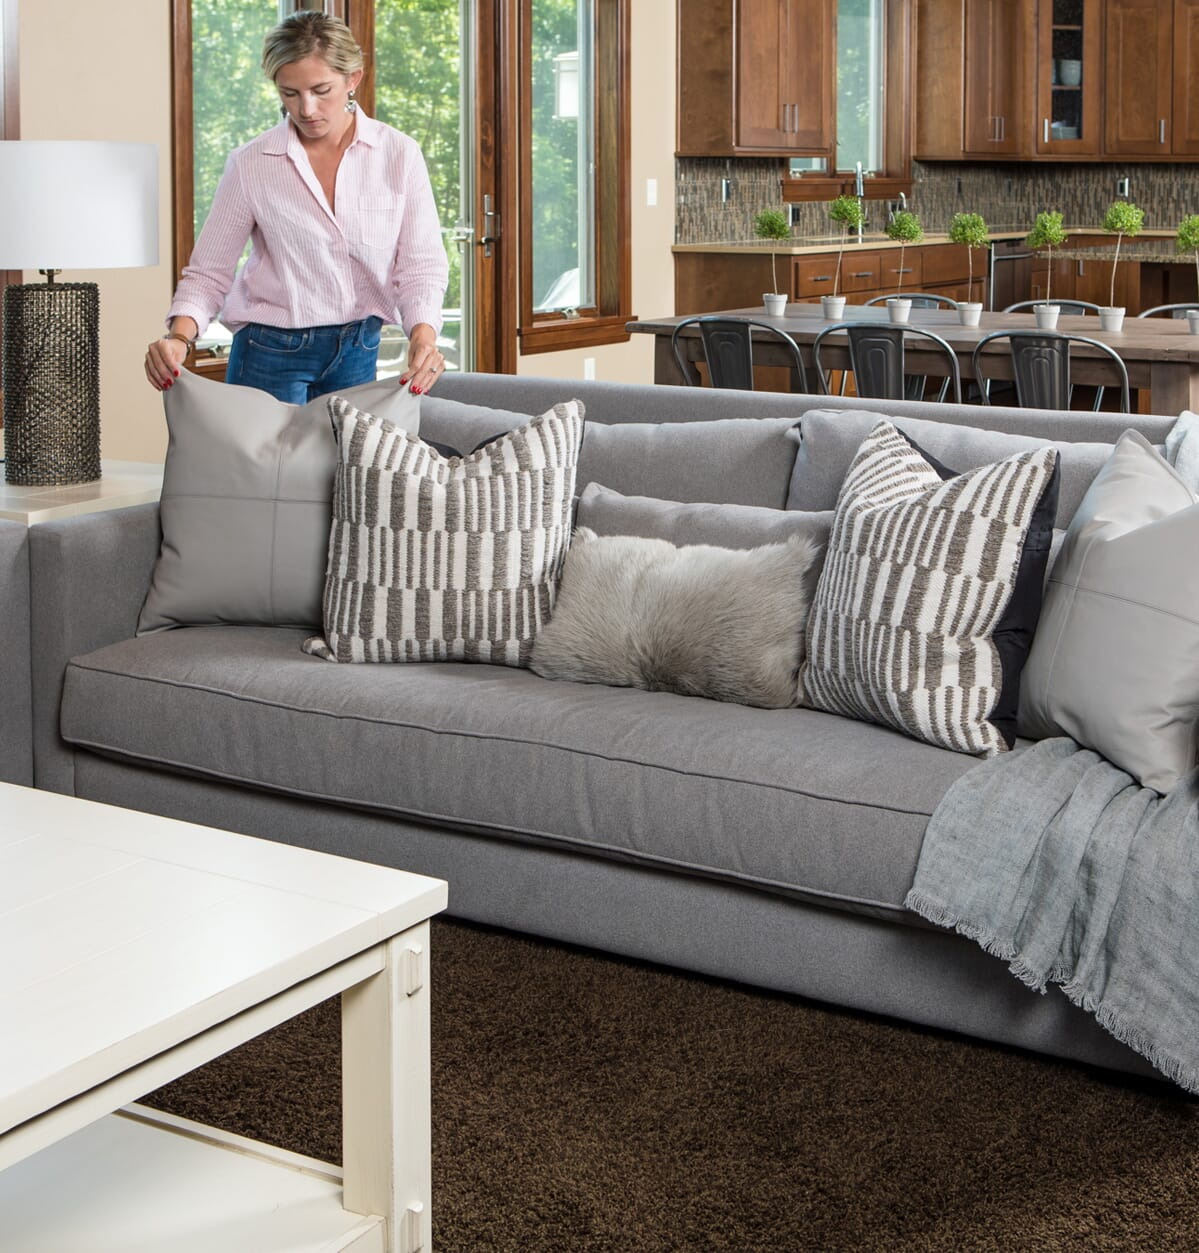 Home Interior Design Services August Haven Consultation